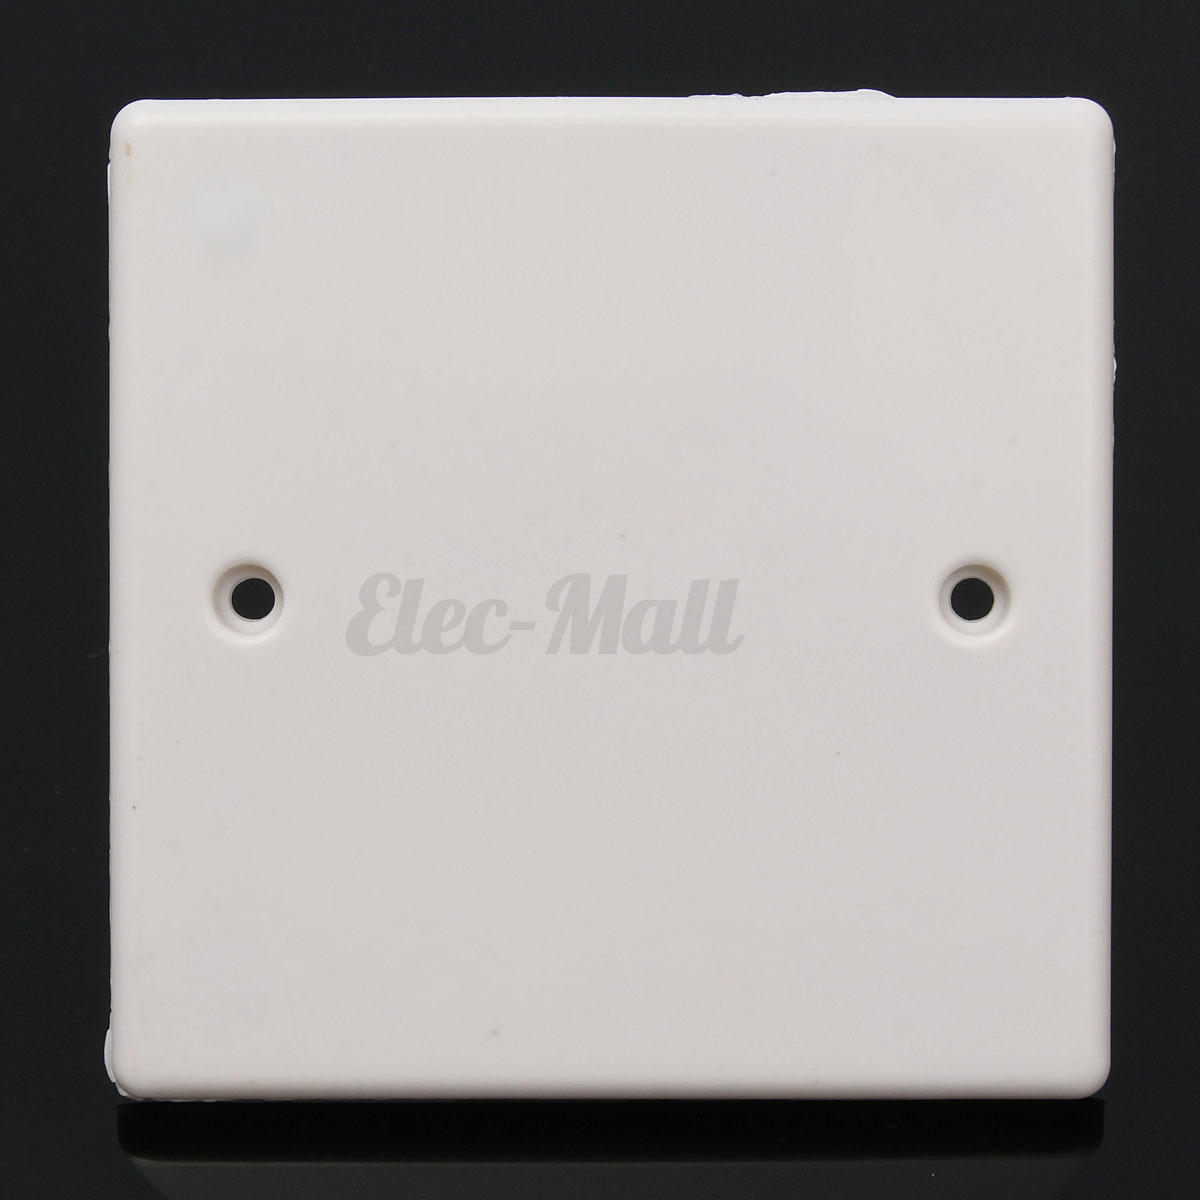 Electric Switch Plug White Plug Elec...